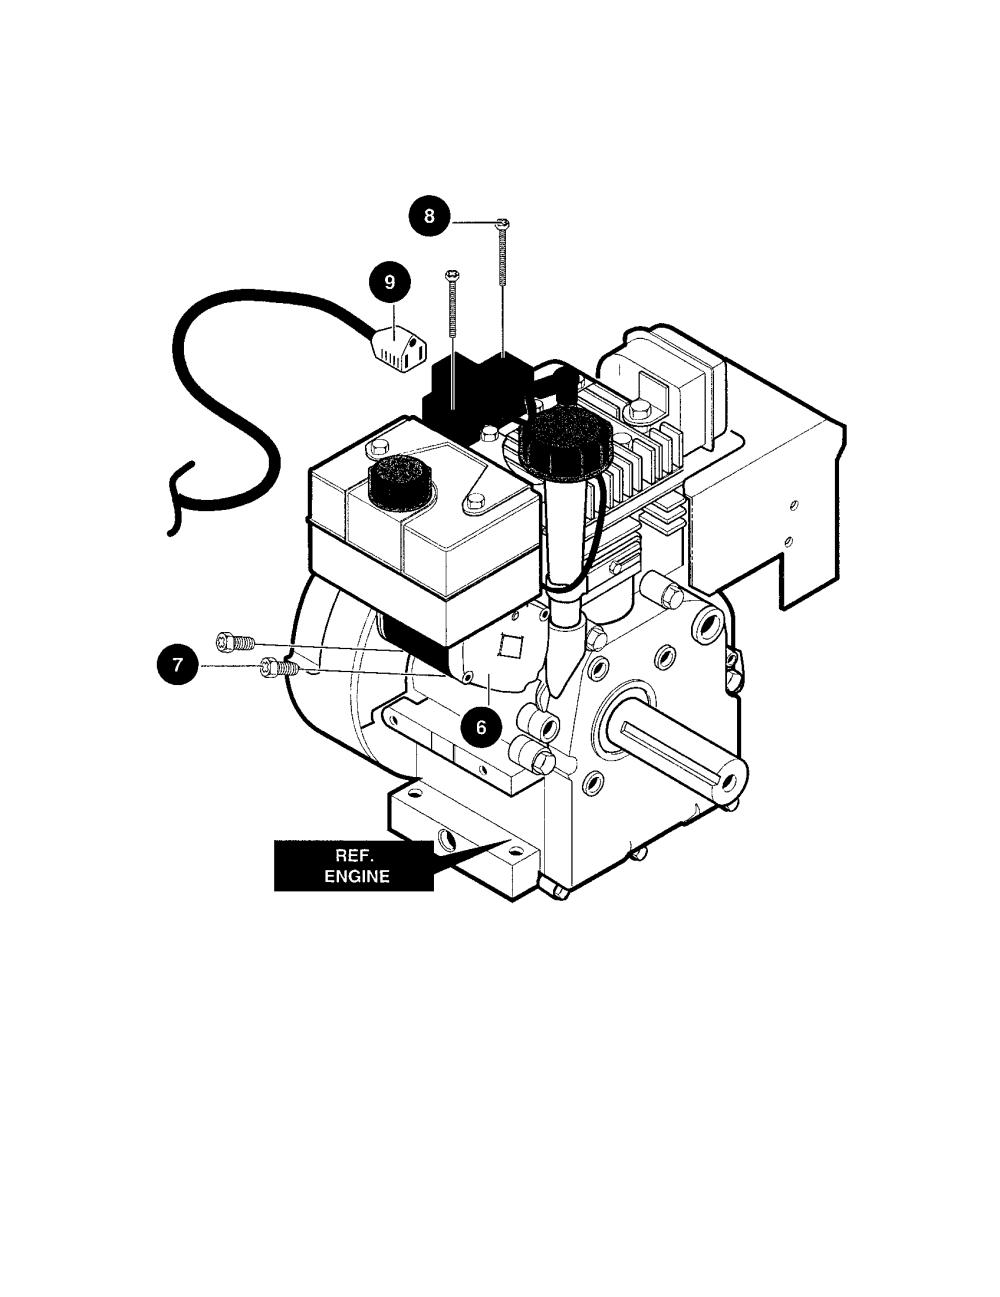 medium resolution of craftsman 536886480 electric starter diagram